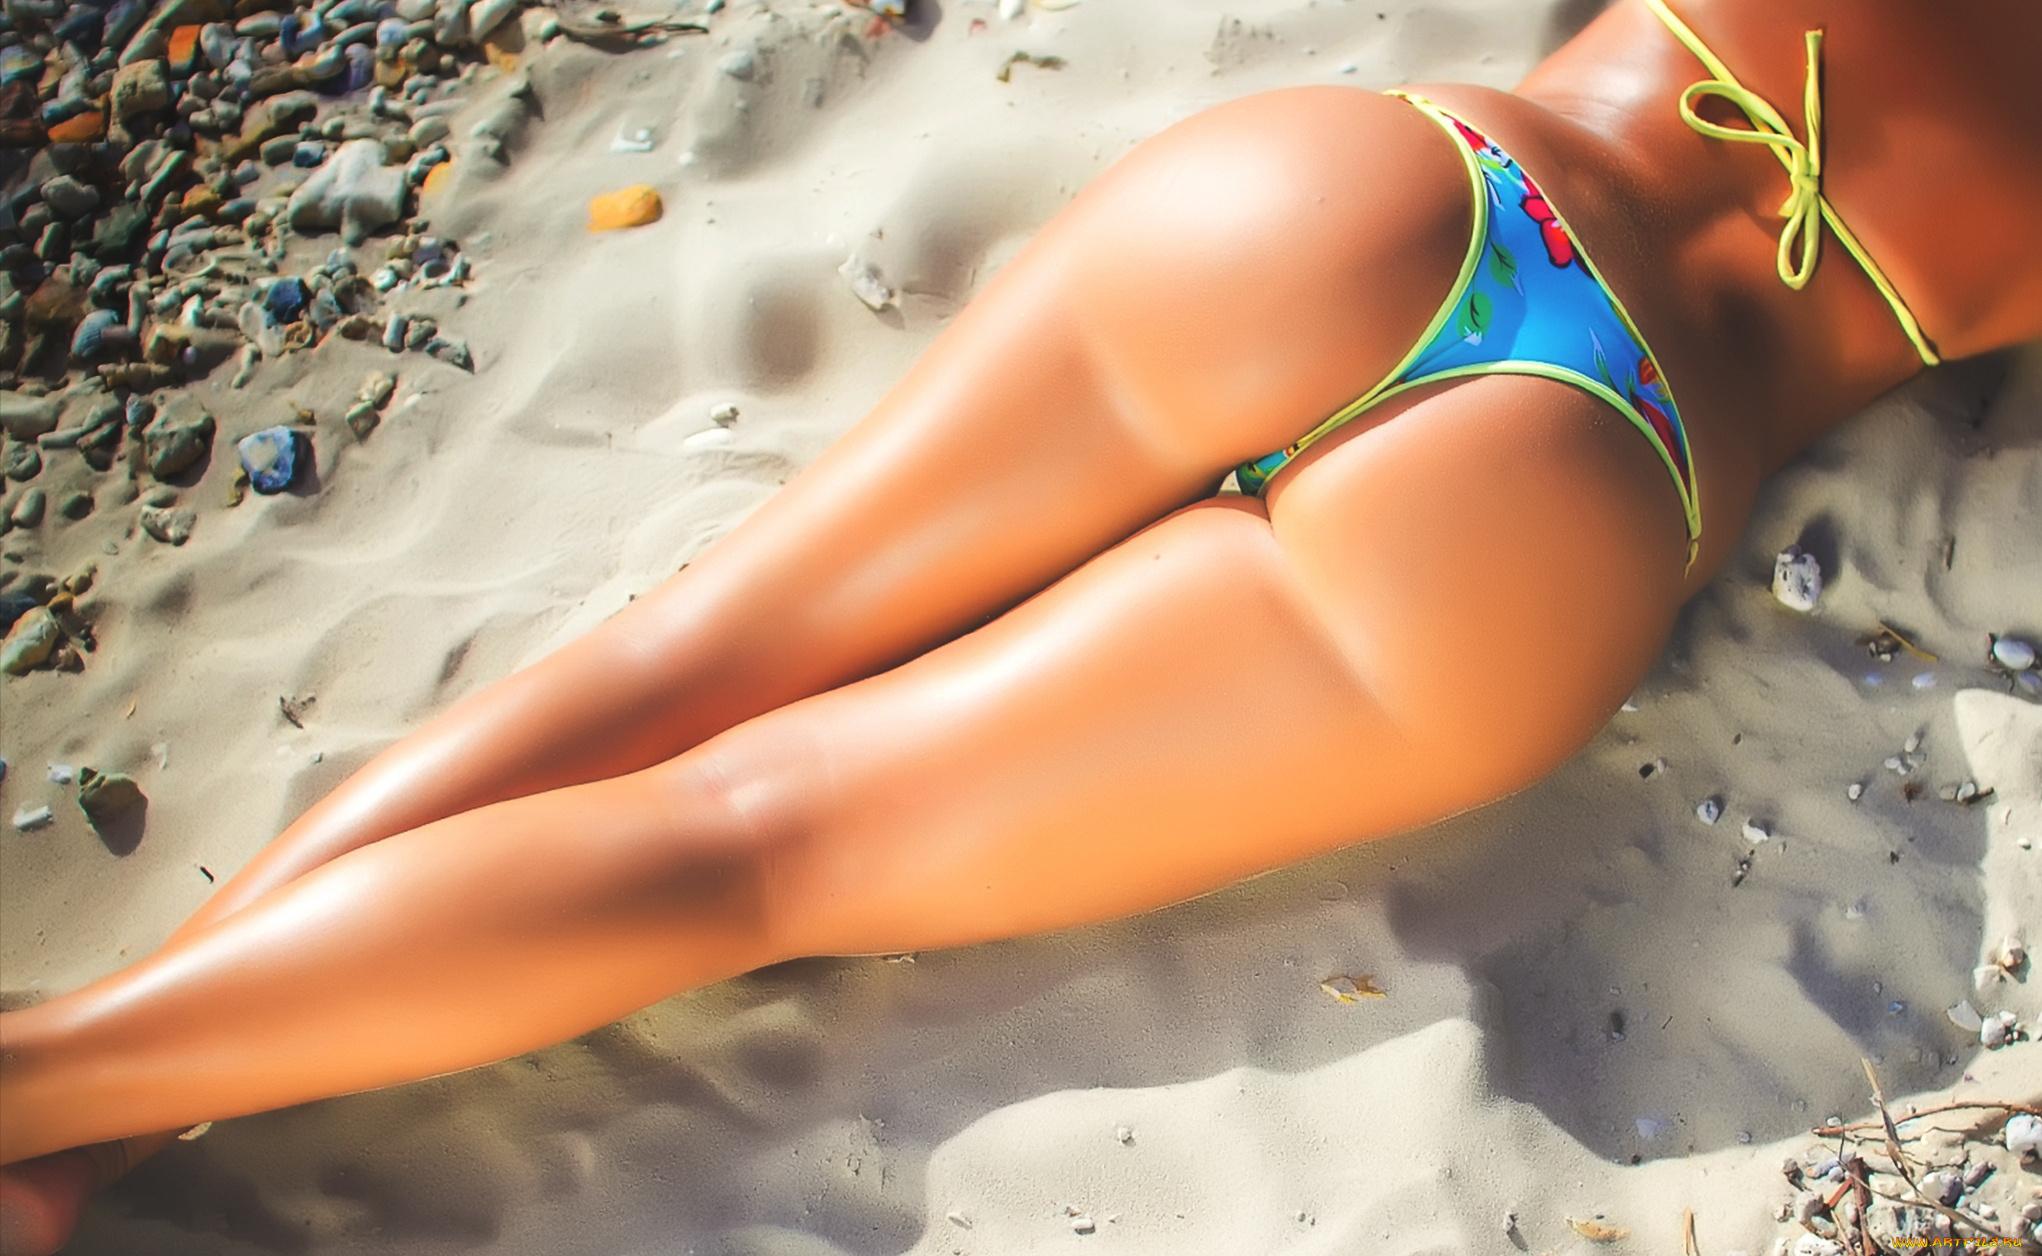 erotika-plyazh-bikini